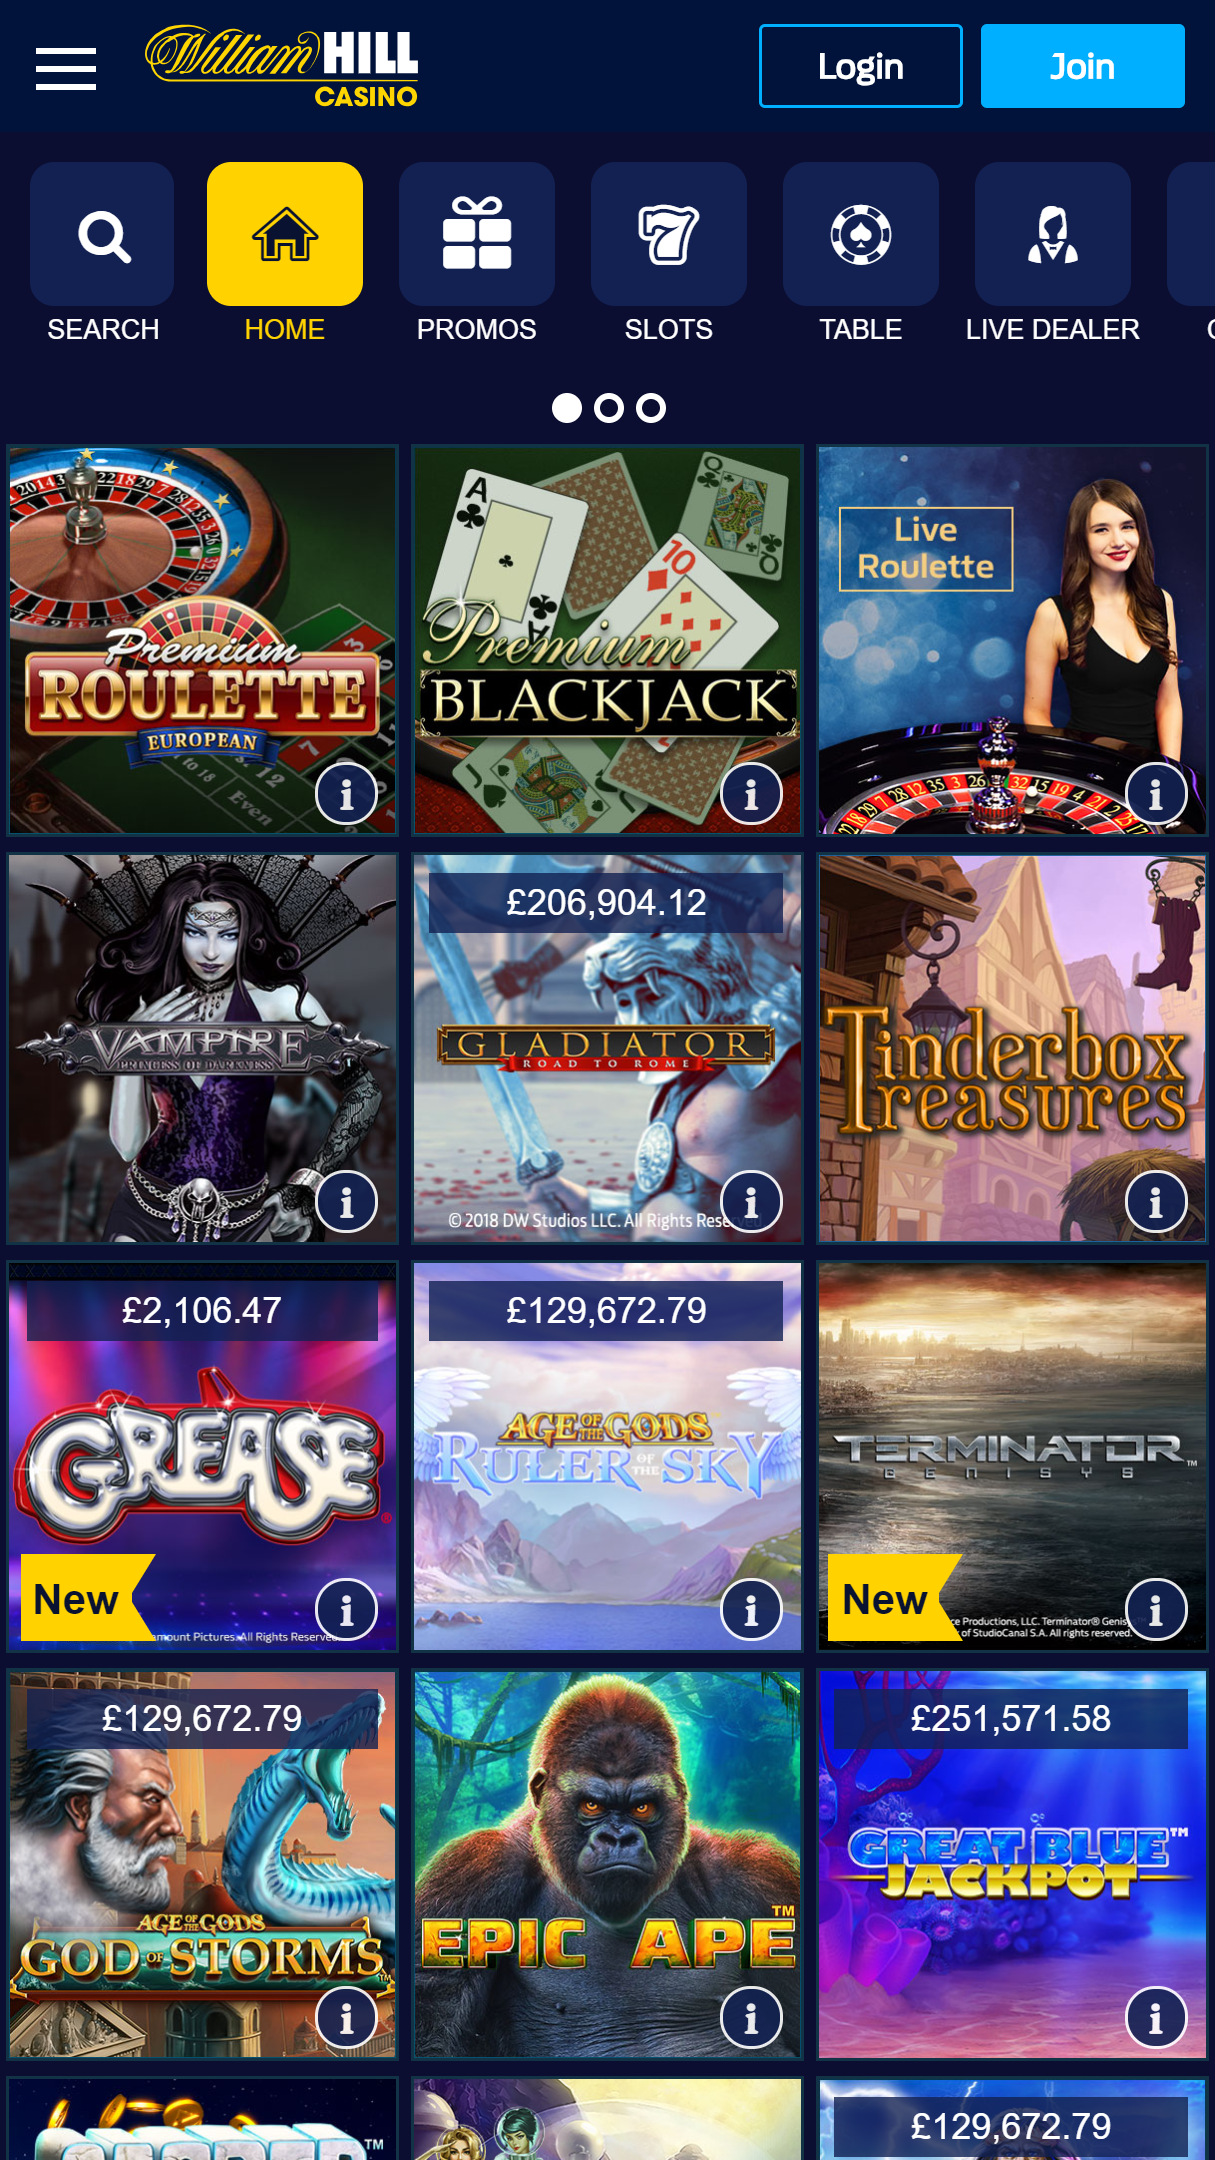 William Hill Casino App Homepage